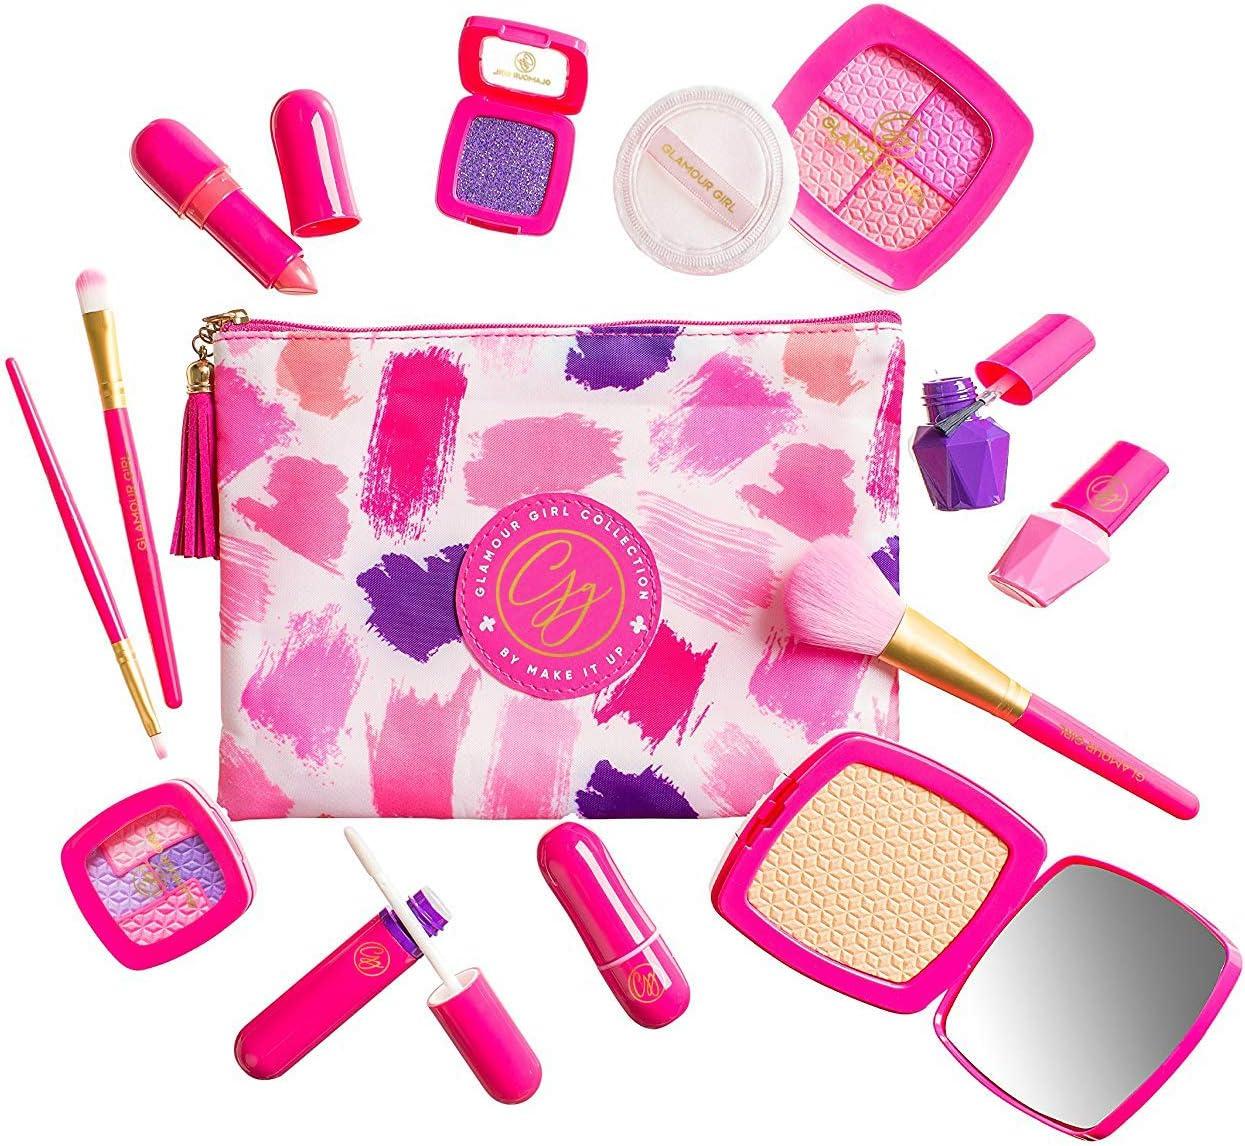 swan-lake-pretend-play-makeup-set-for-kids